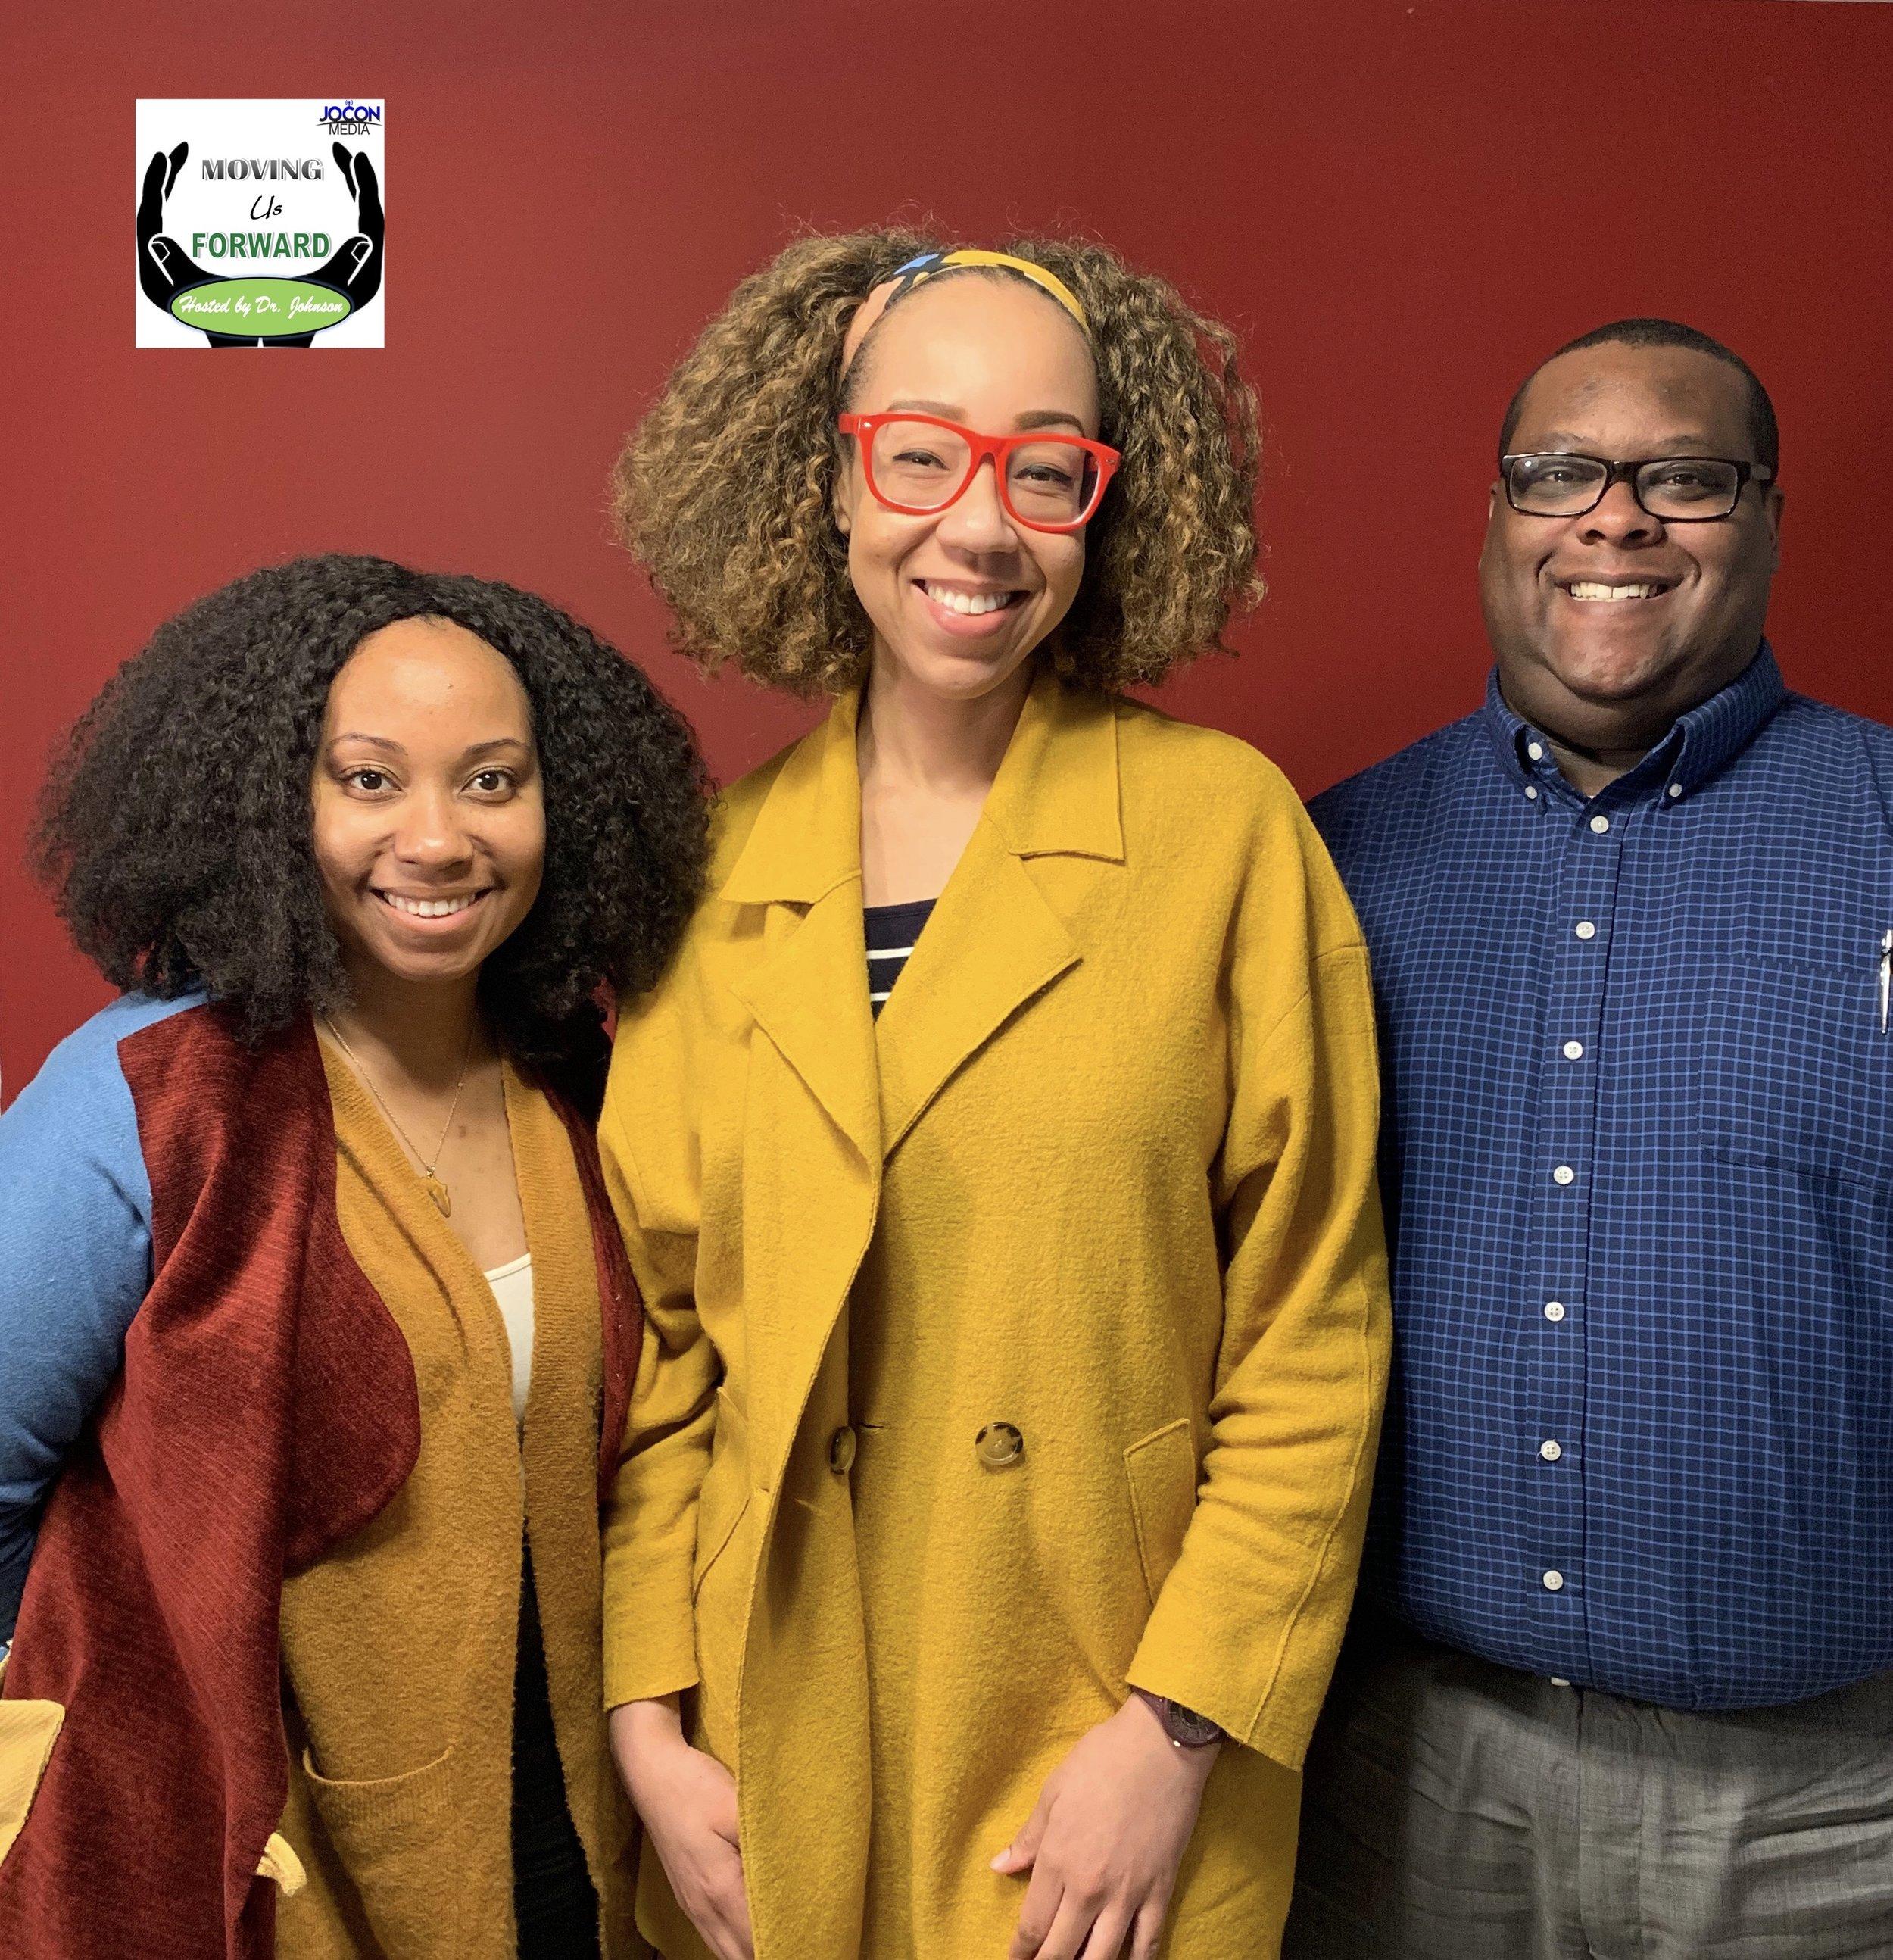 L to R: Kira Van Niel, Host Dr. Raegan Johnson, and Marius Johnson-Malone